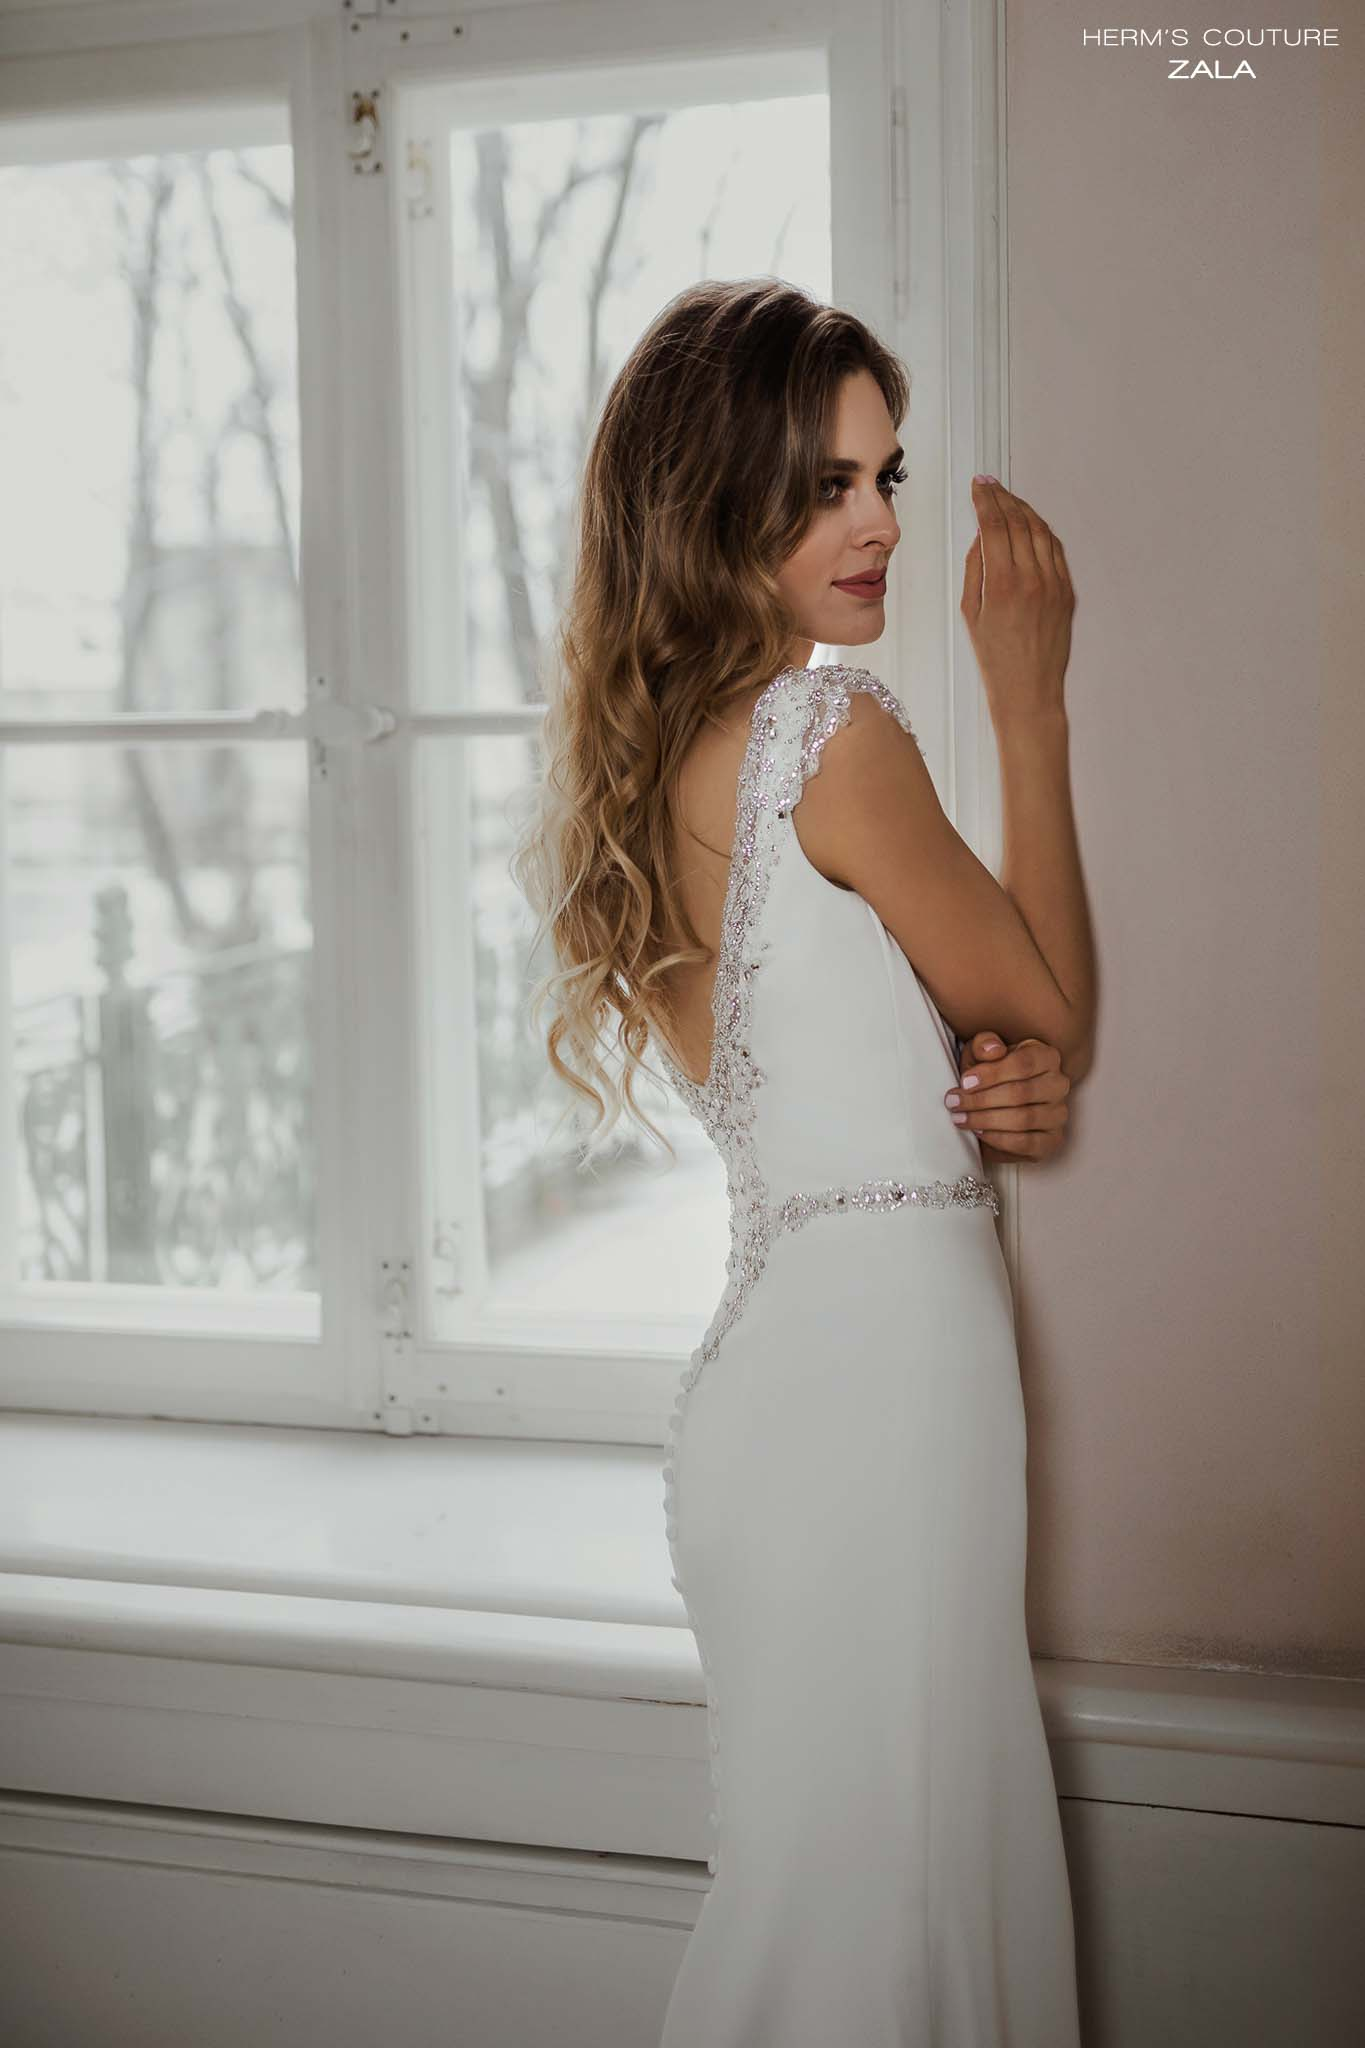 suknia ślubna Herm's Couture Zala